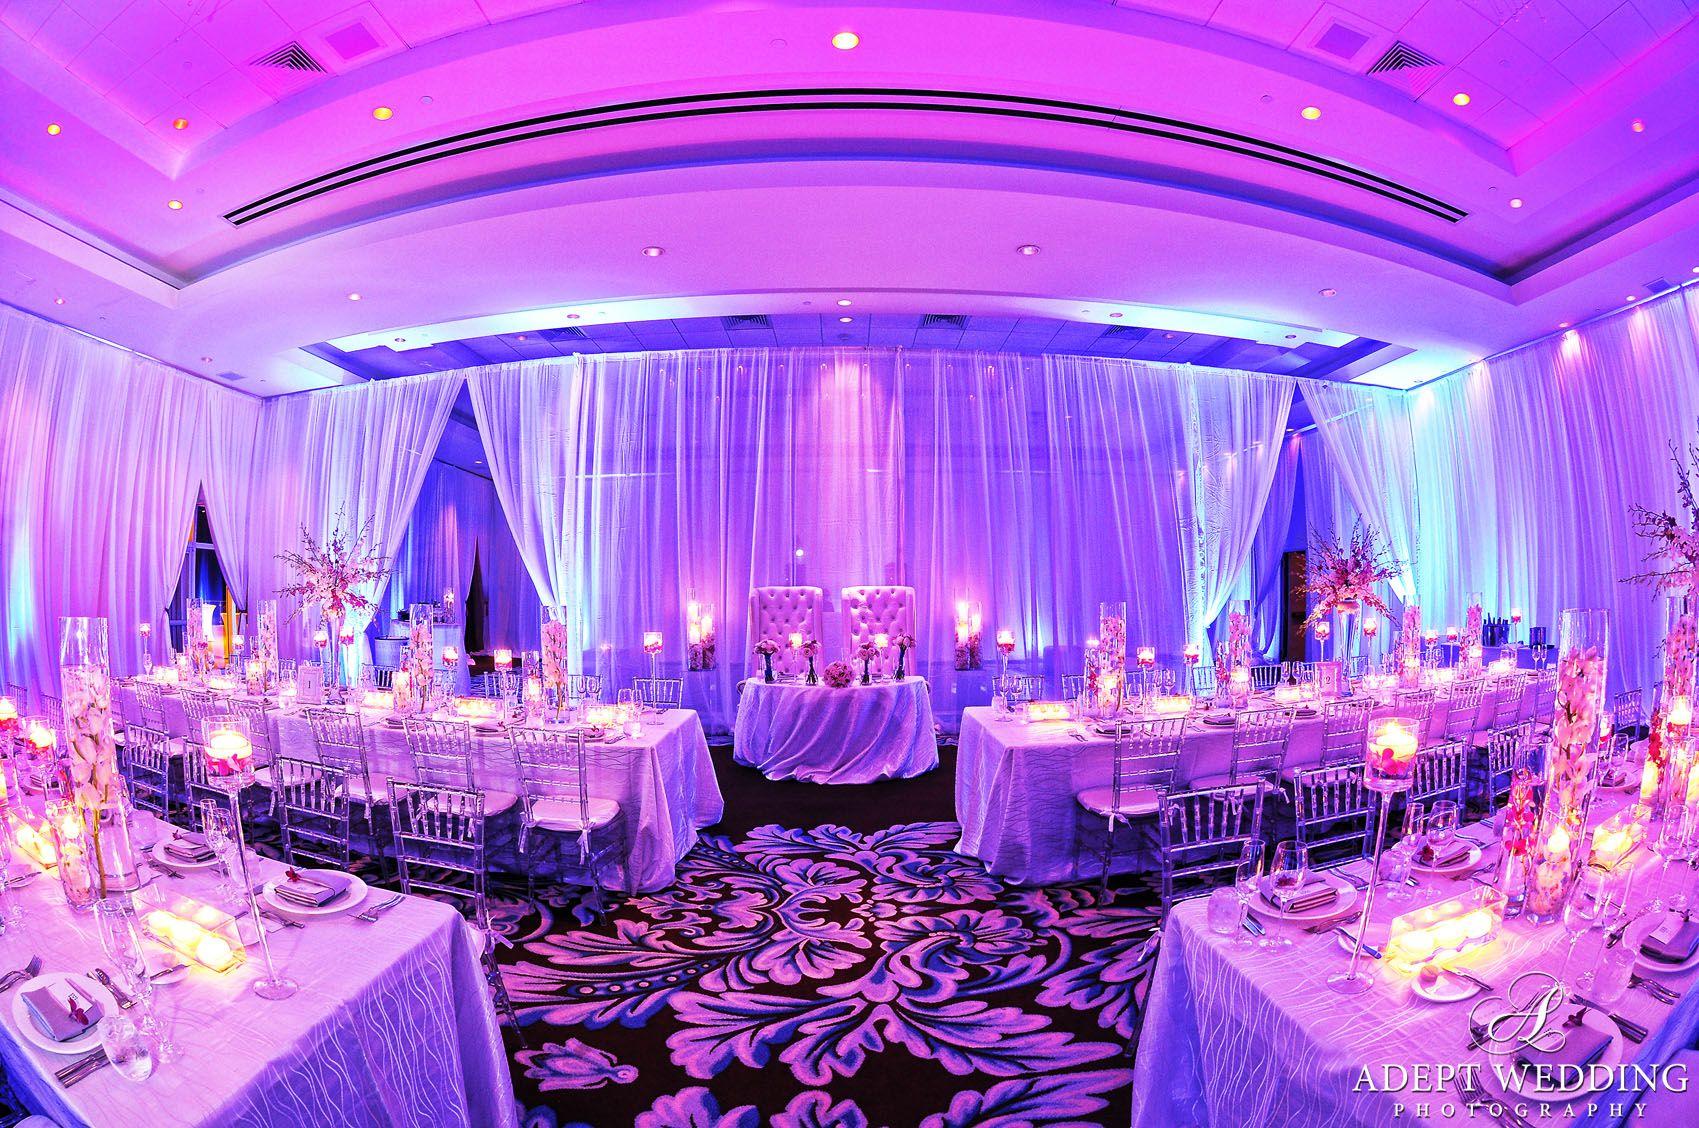 fountainebleau hotel resort miami beach florida wedding venue wedding photography